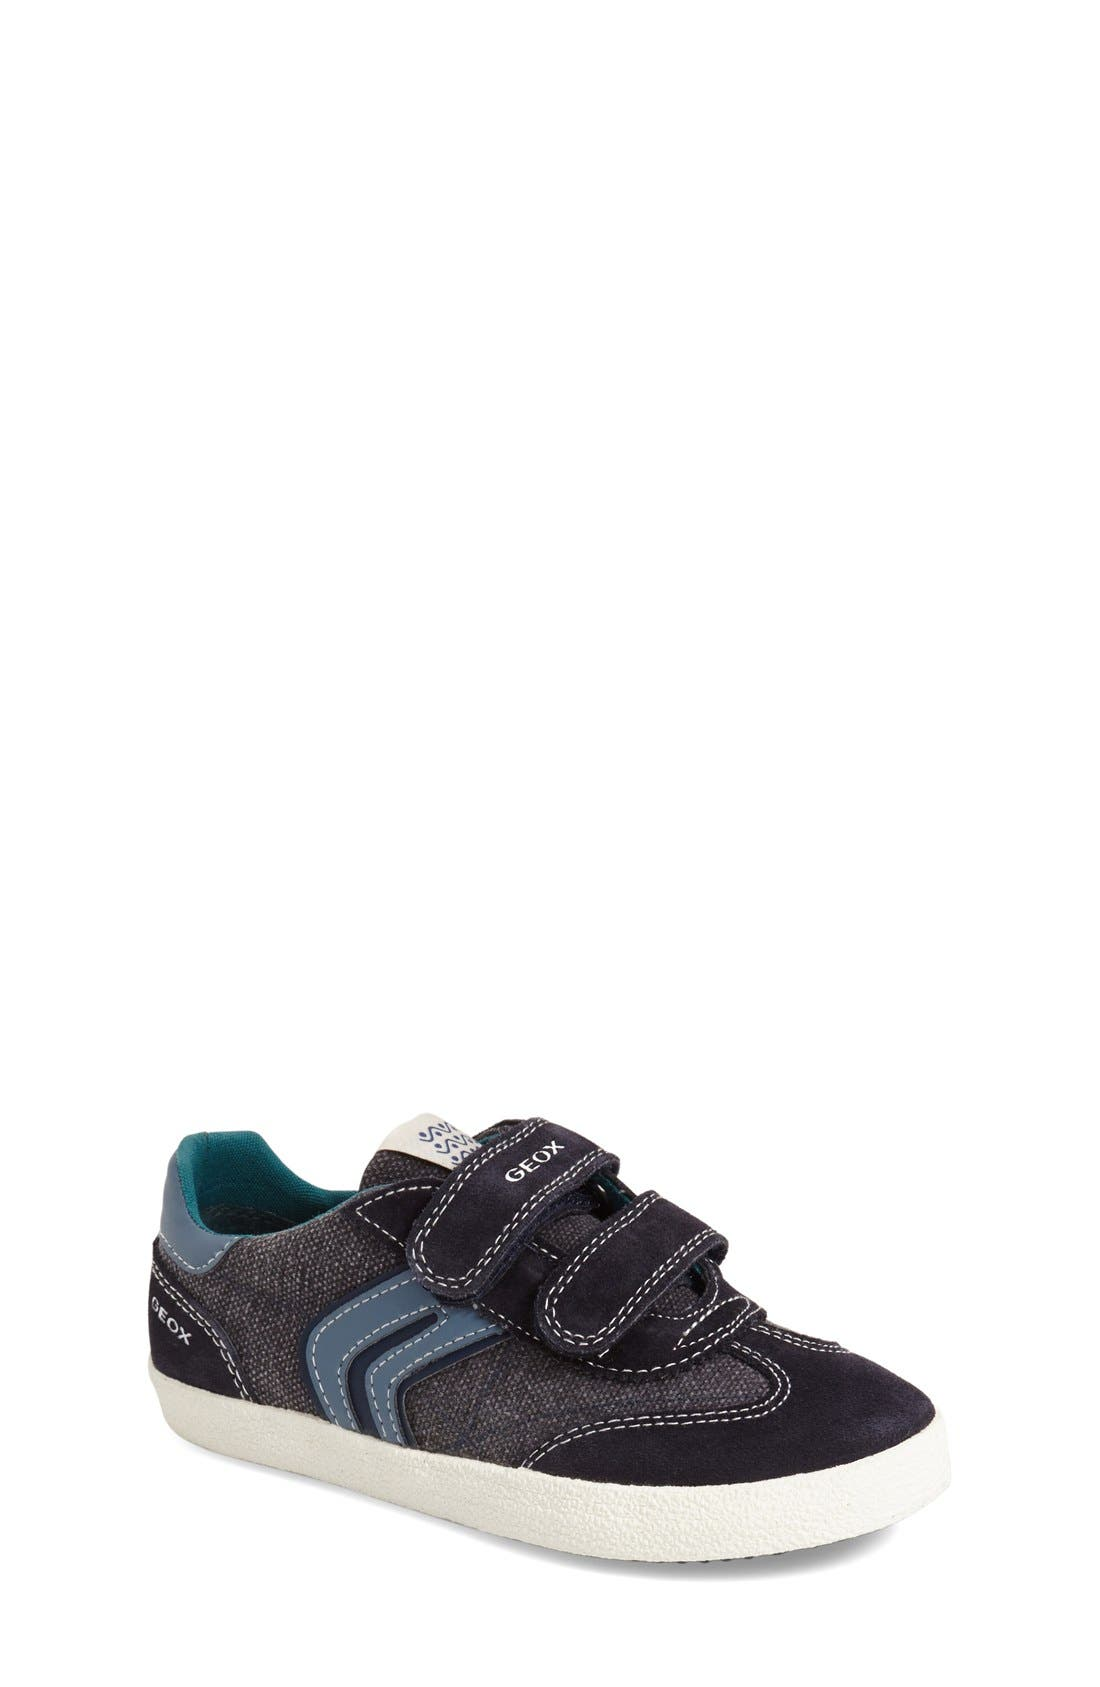 Geox 'Kiwi' Sneaker (Toddler, Little Kid & Big Kid)